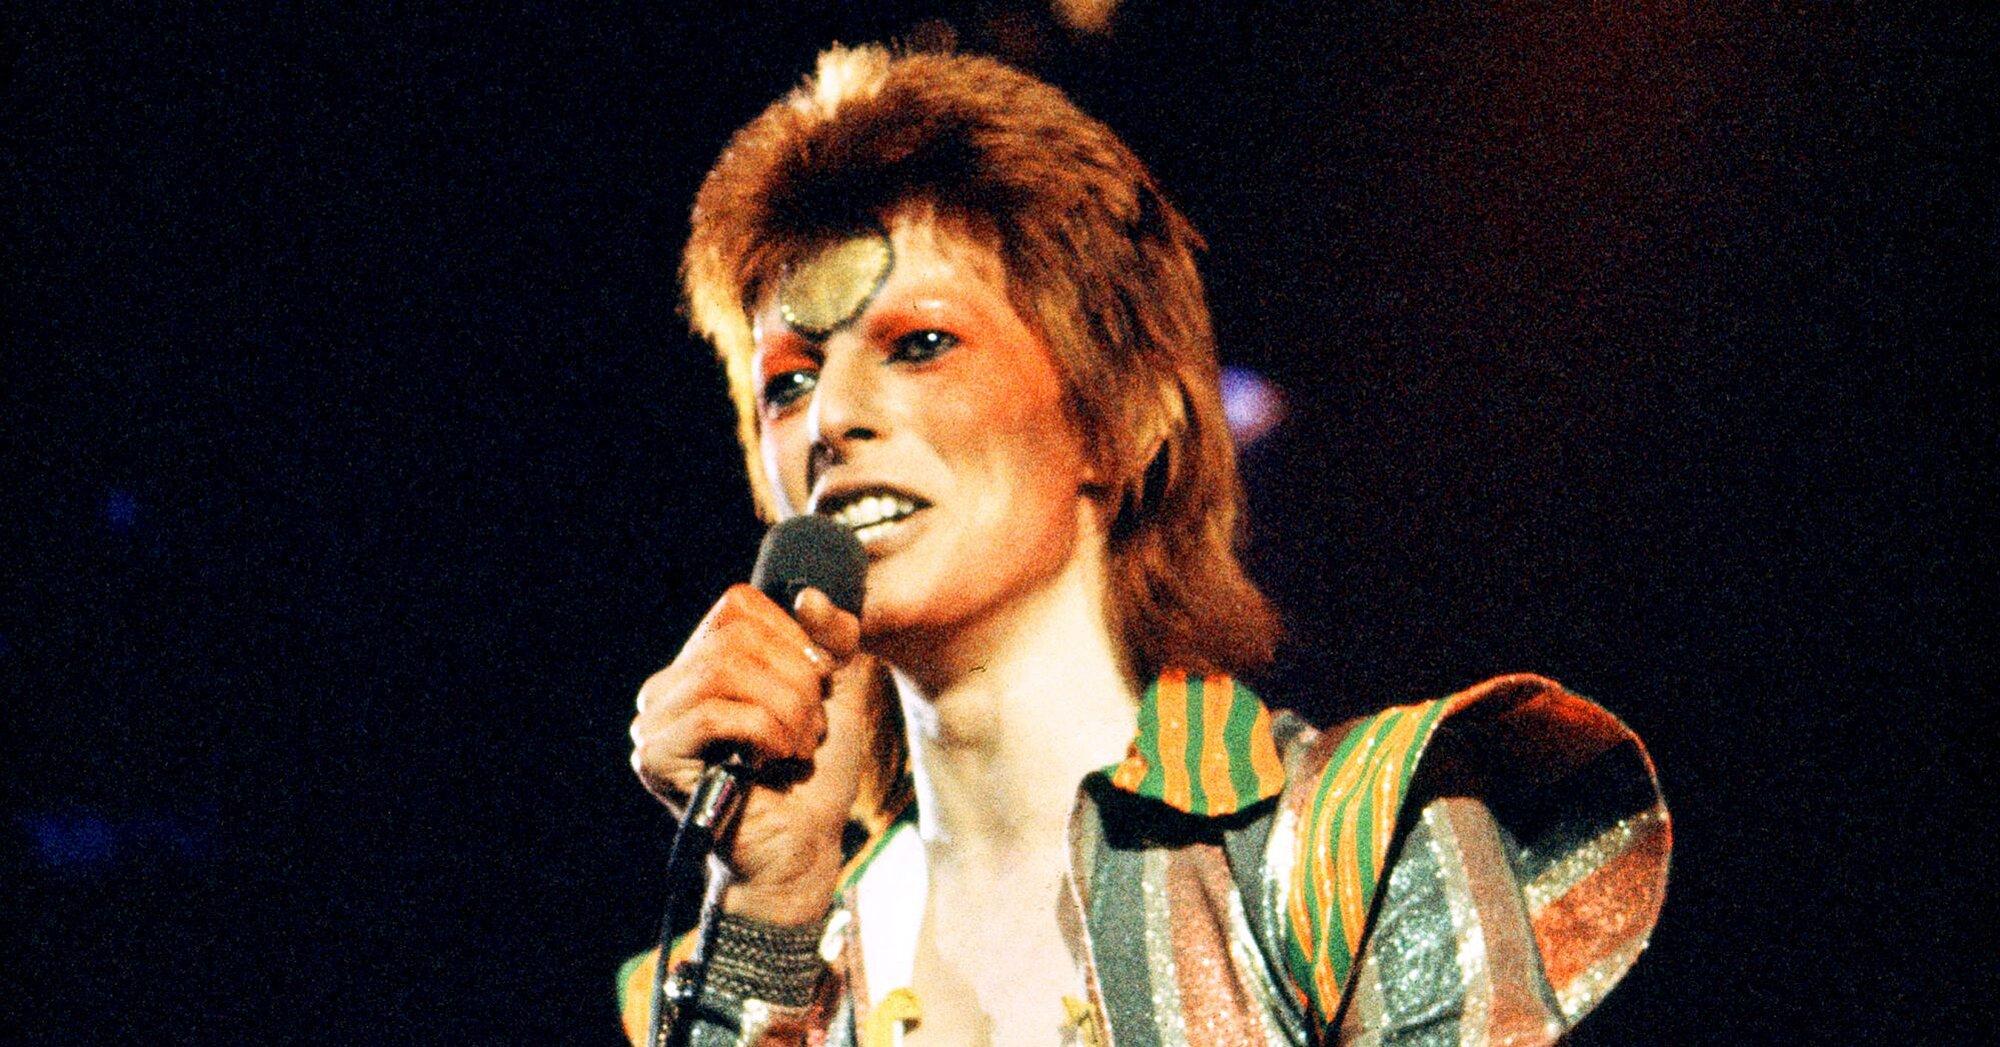 David Bowie S Space Oddity 50th Anniversary Video Ew Com